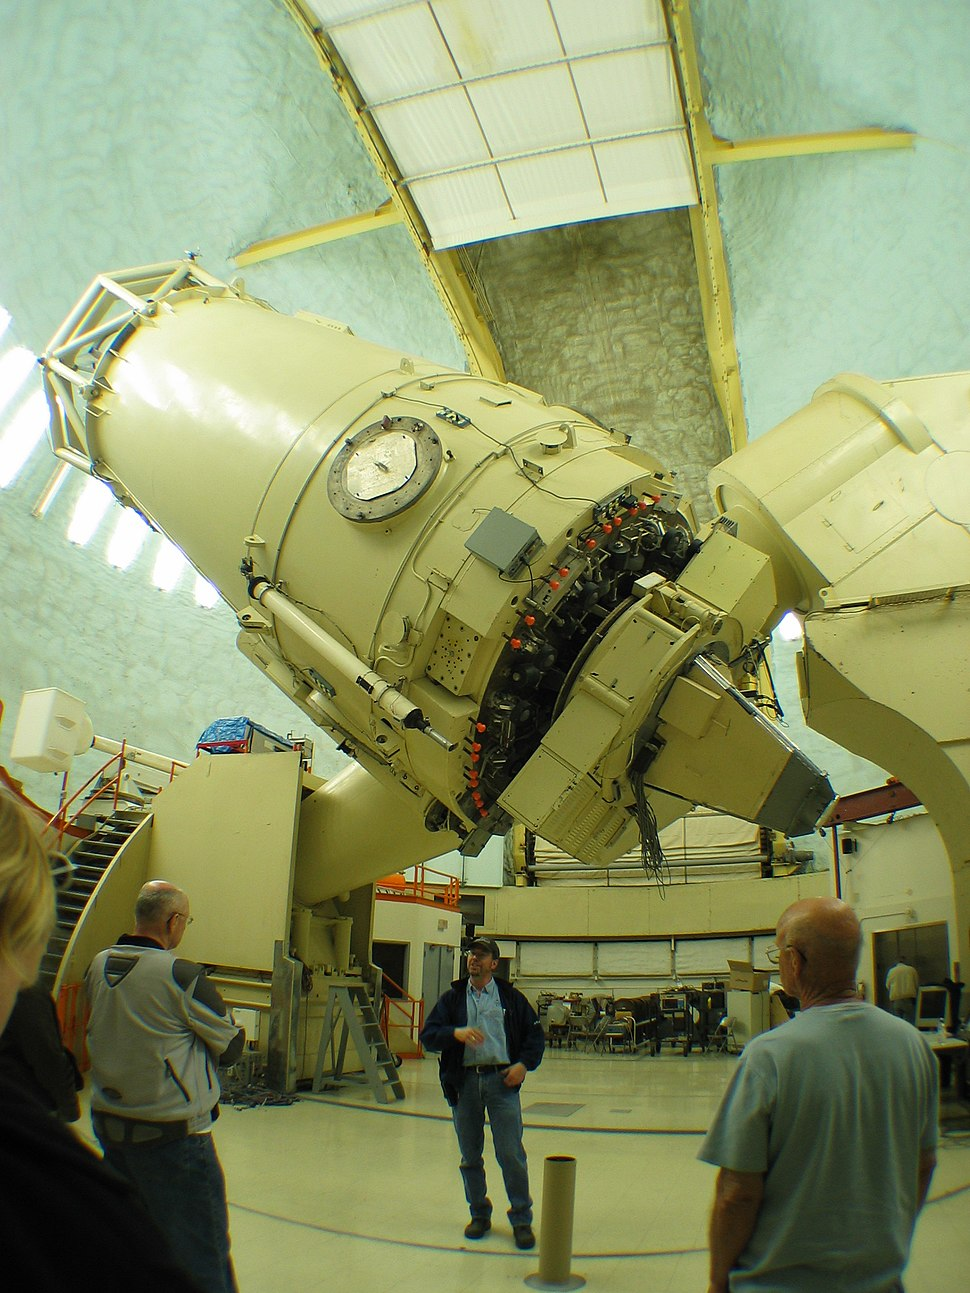 USA harlan j smith telescope TX